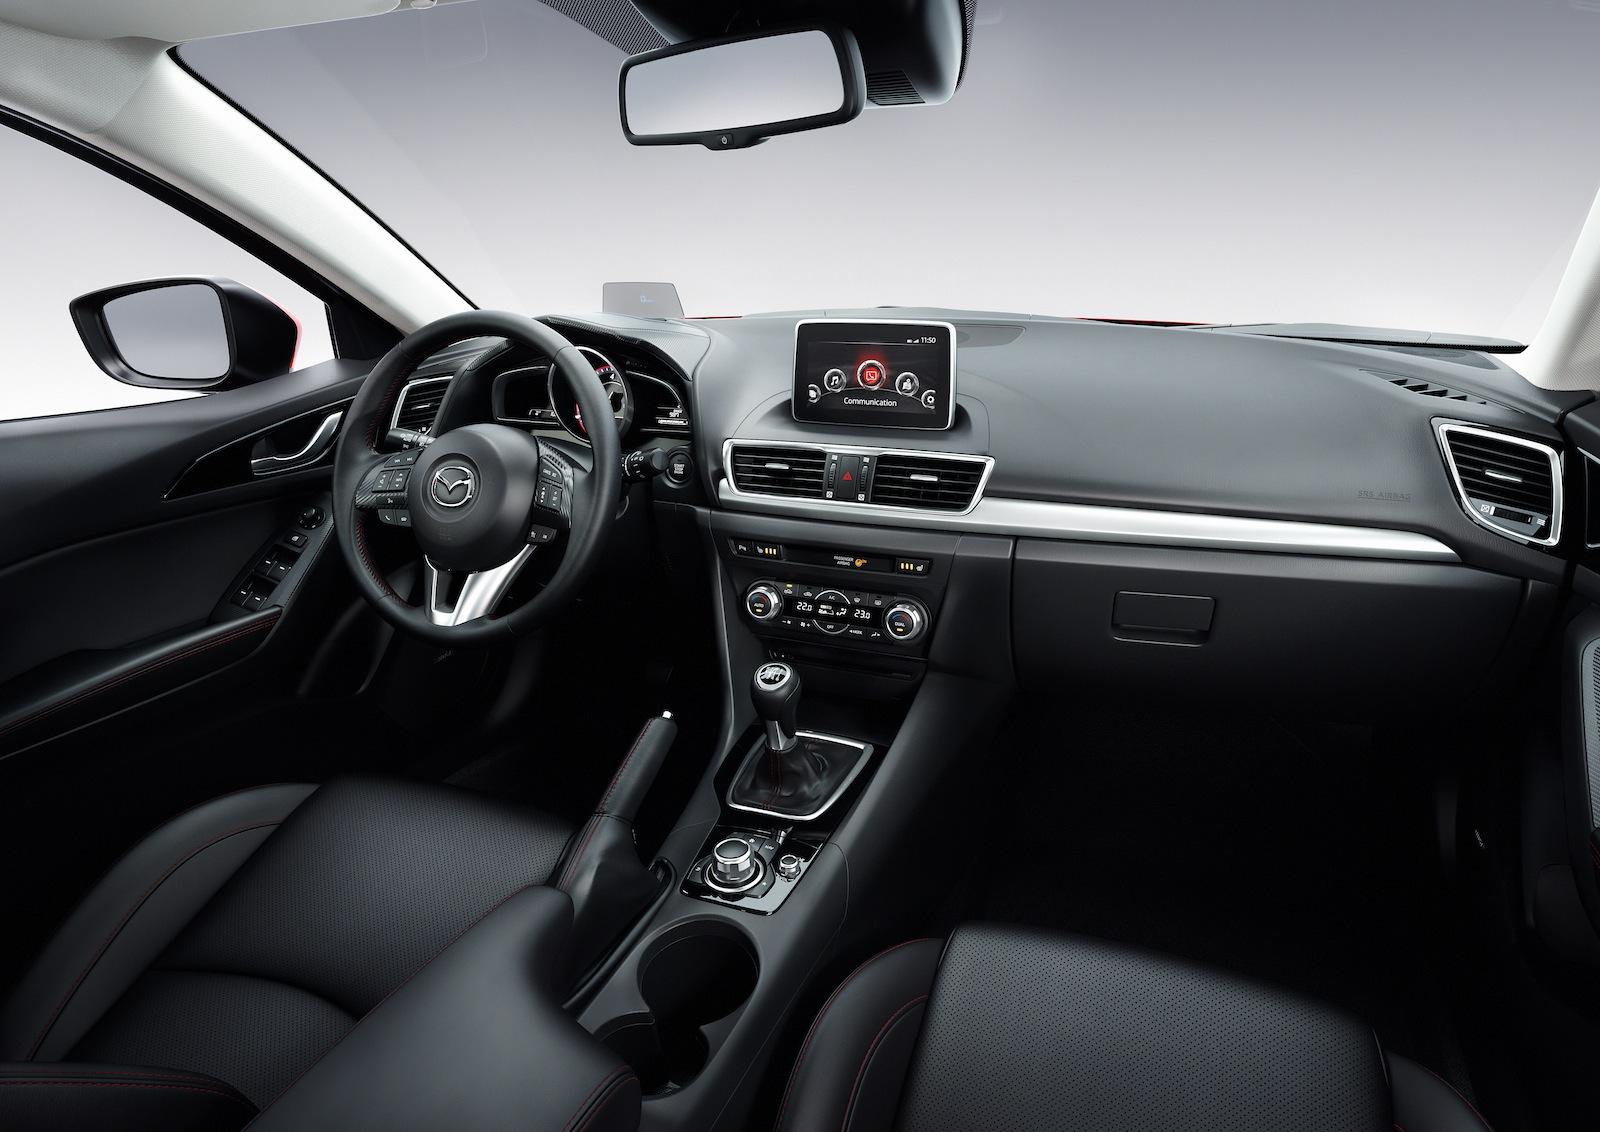 Mazda 3: New Small Car Wonu0027t Join Sub $20K Price War